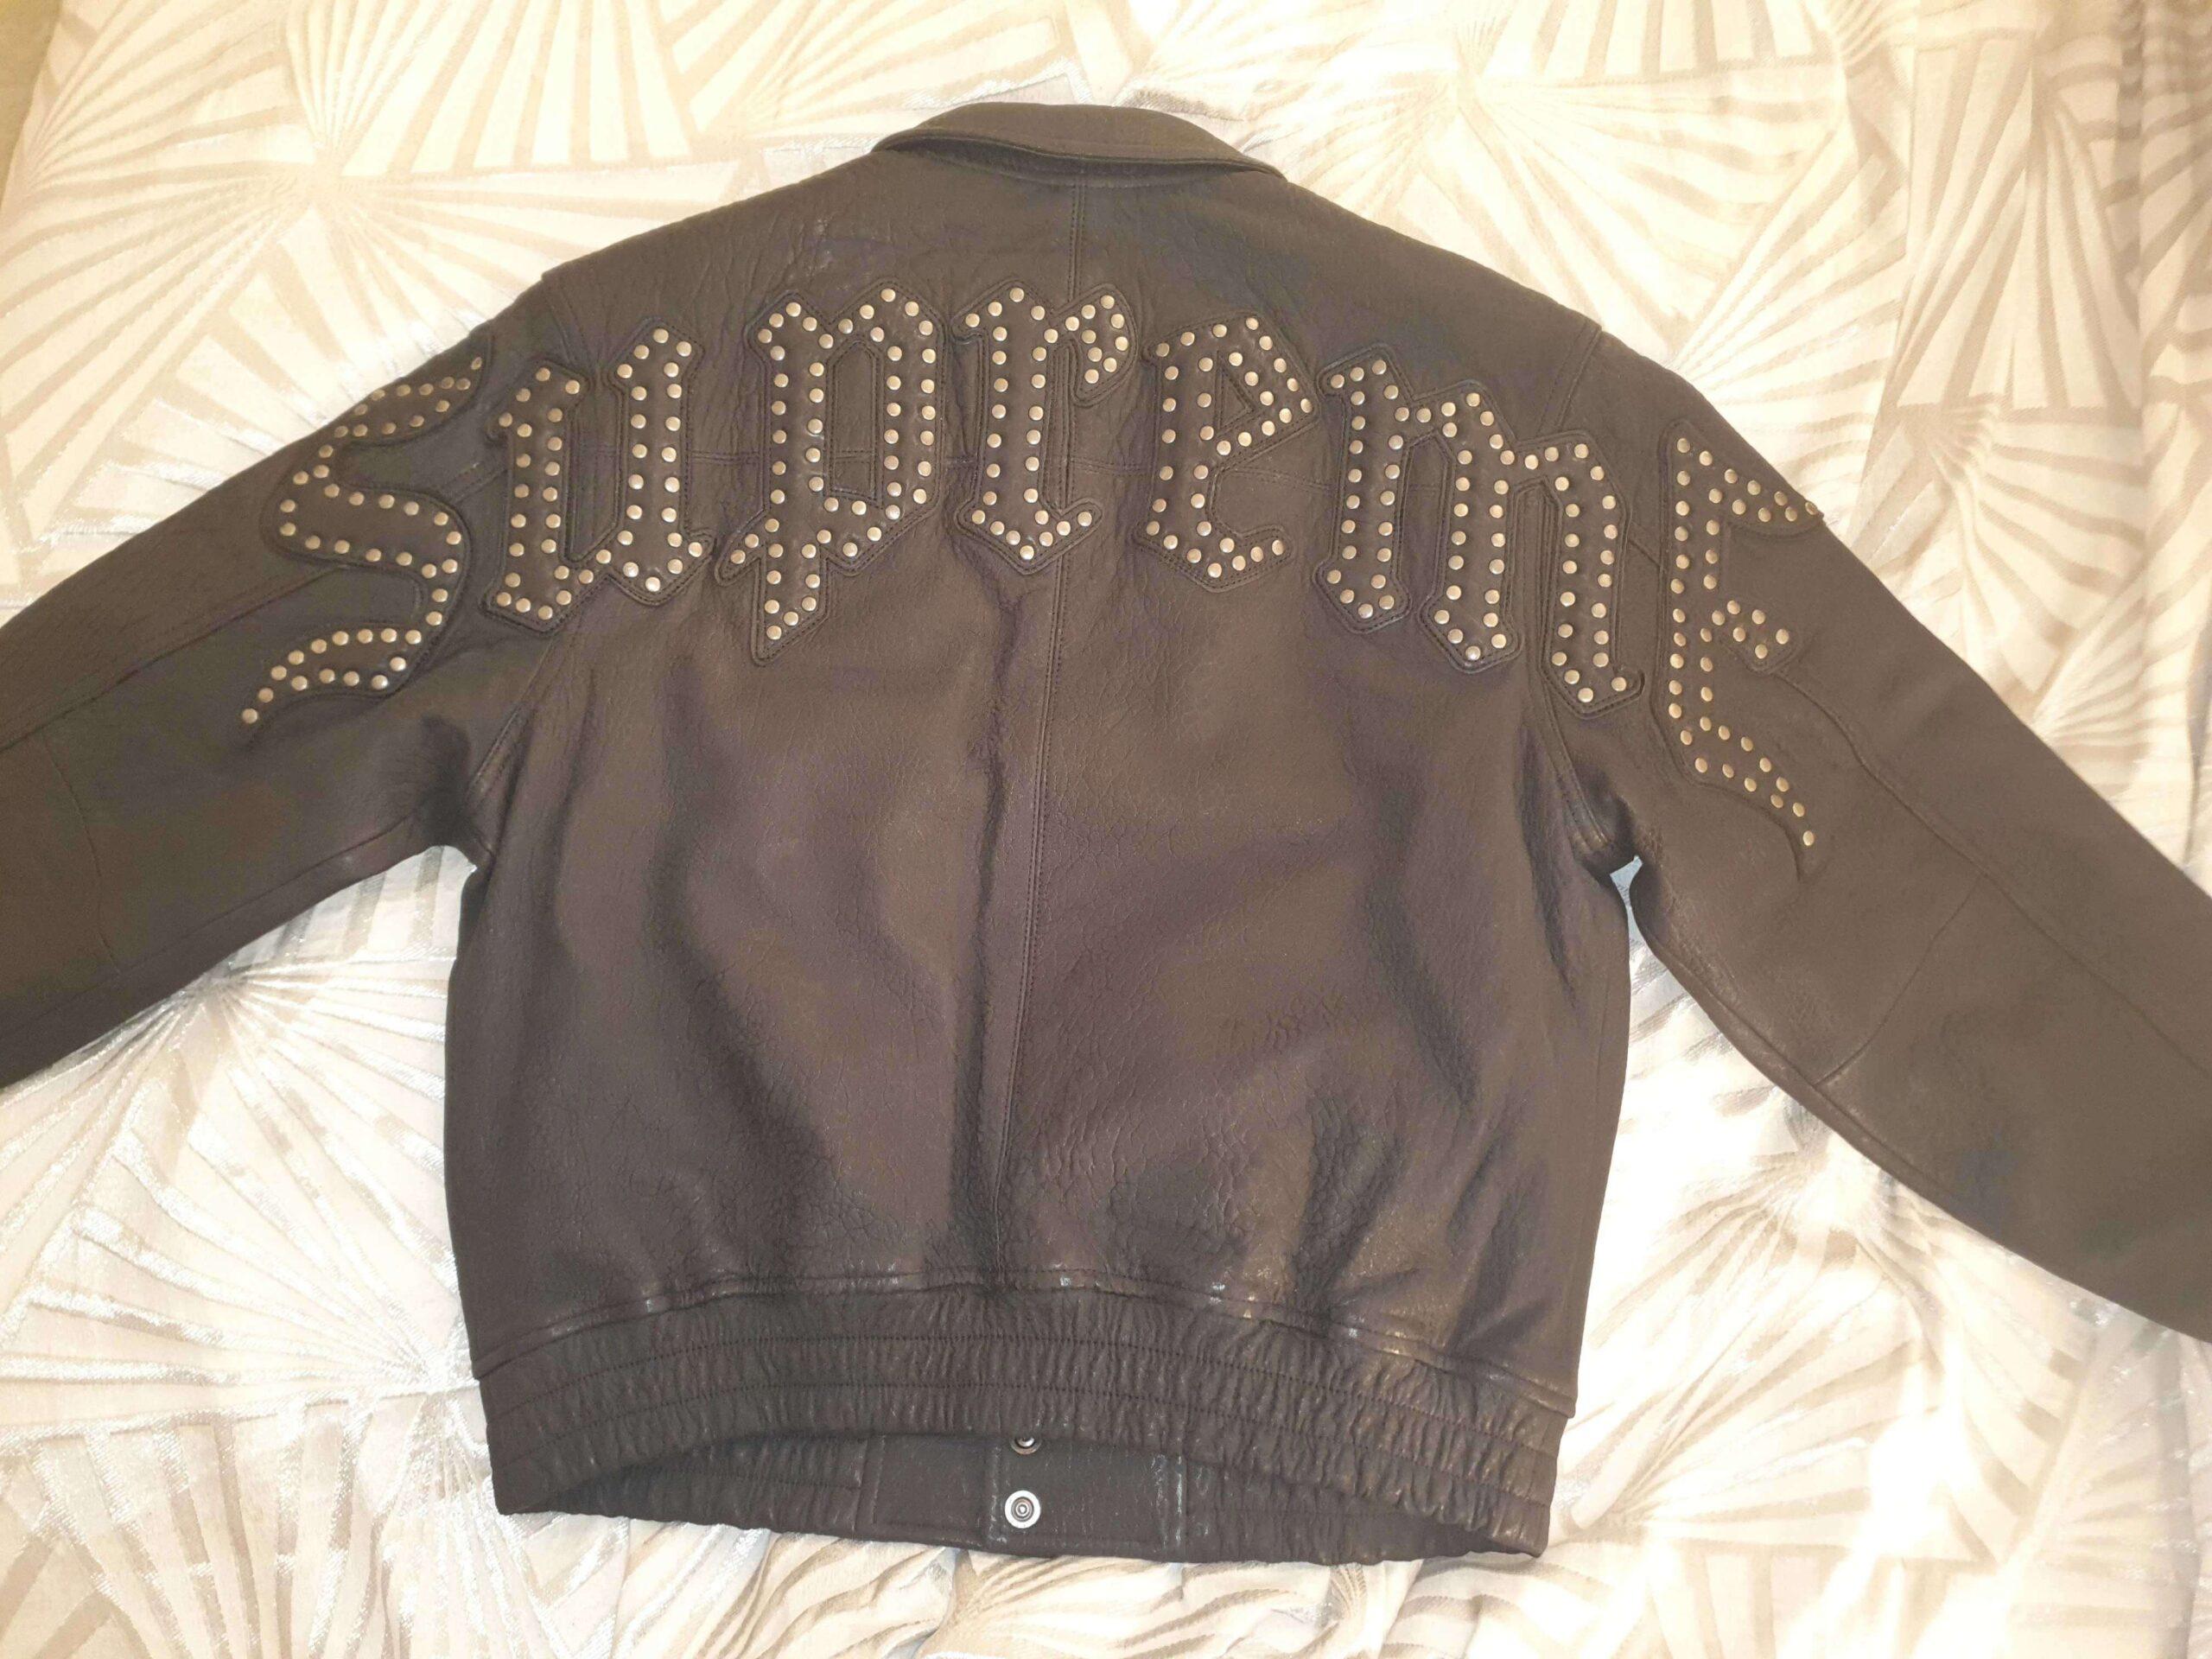 Black Supreme Pebbled Leather JacketBlack Supreme Pebbled Leather Jacket